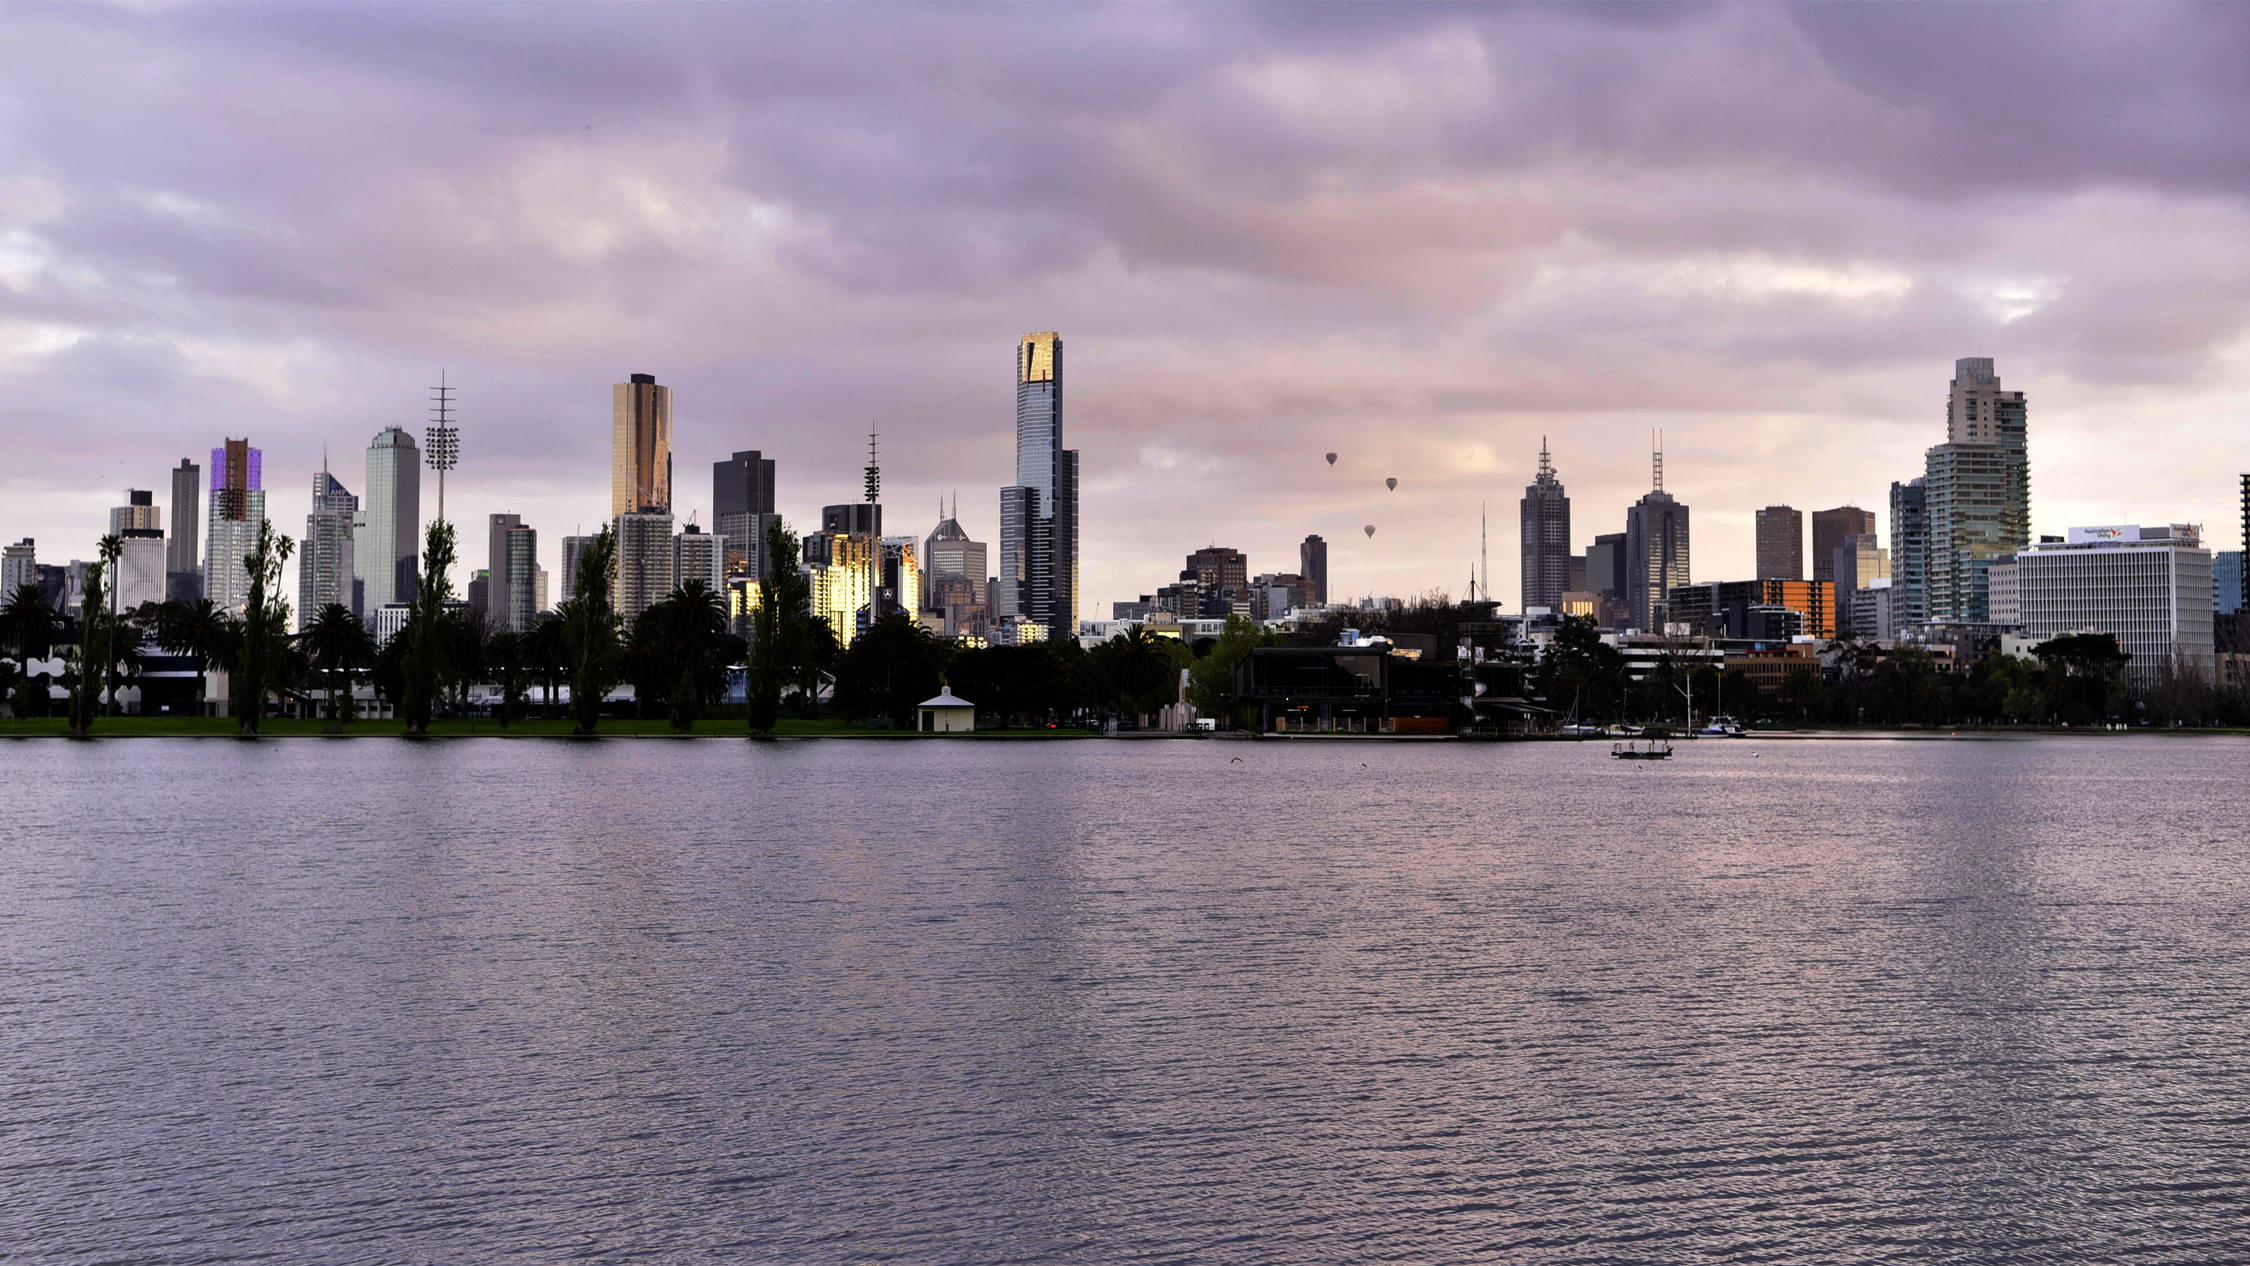 Albert Park Lake & Melbourne City Skyline